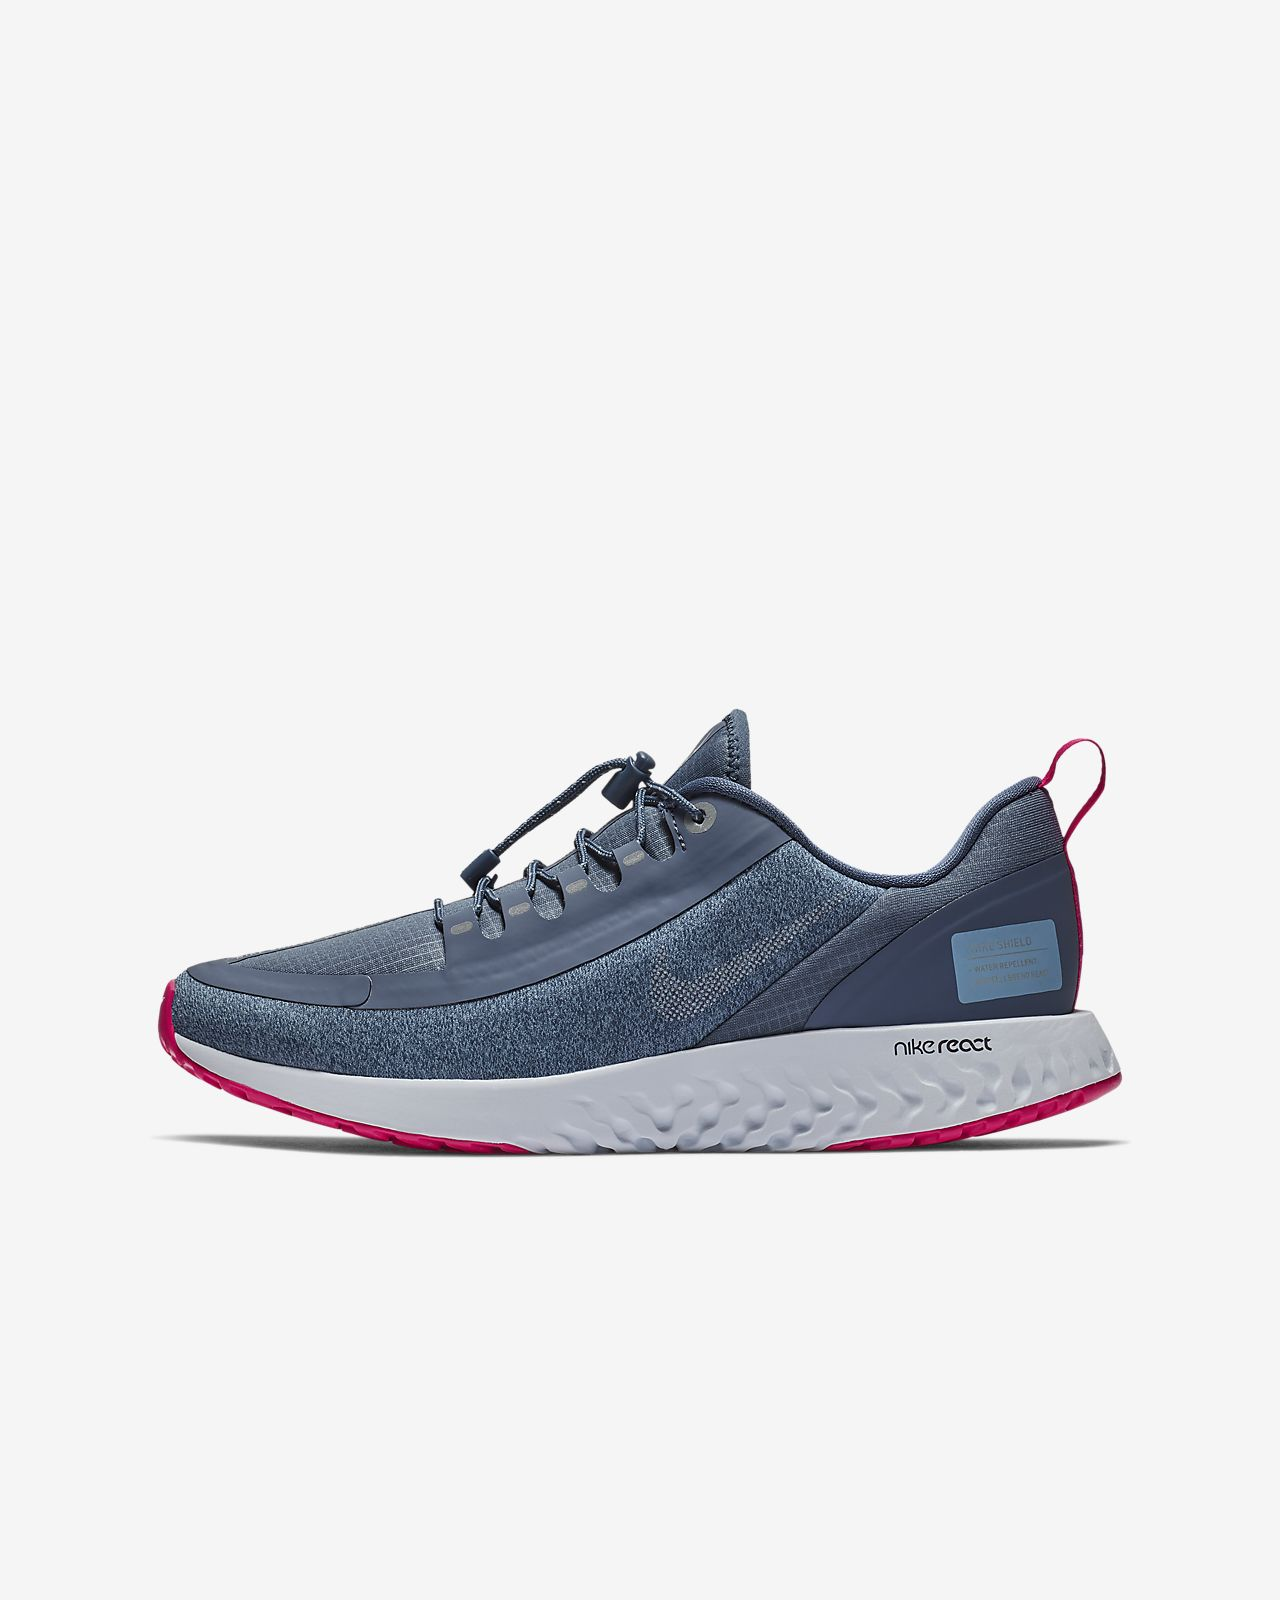 separation shoes df66a 087f8 ... Nike Legend React Shield Older Kids  Running Shoe